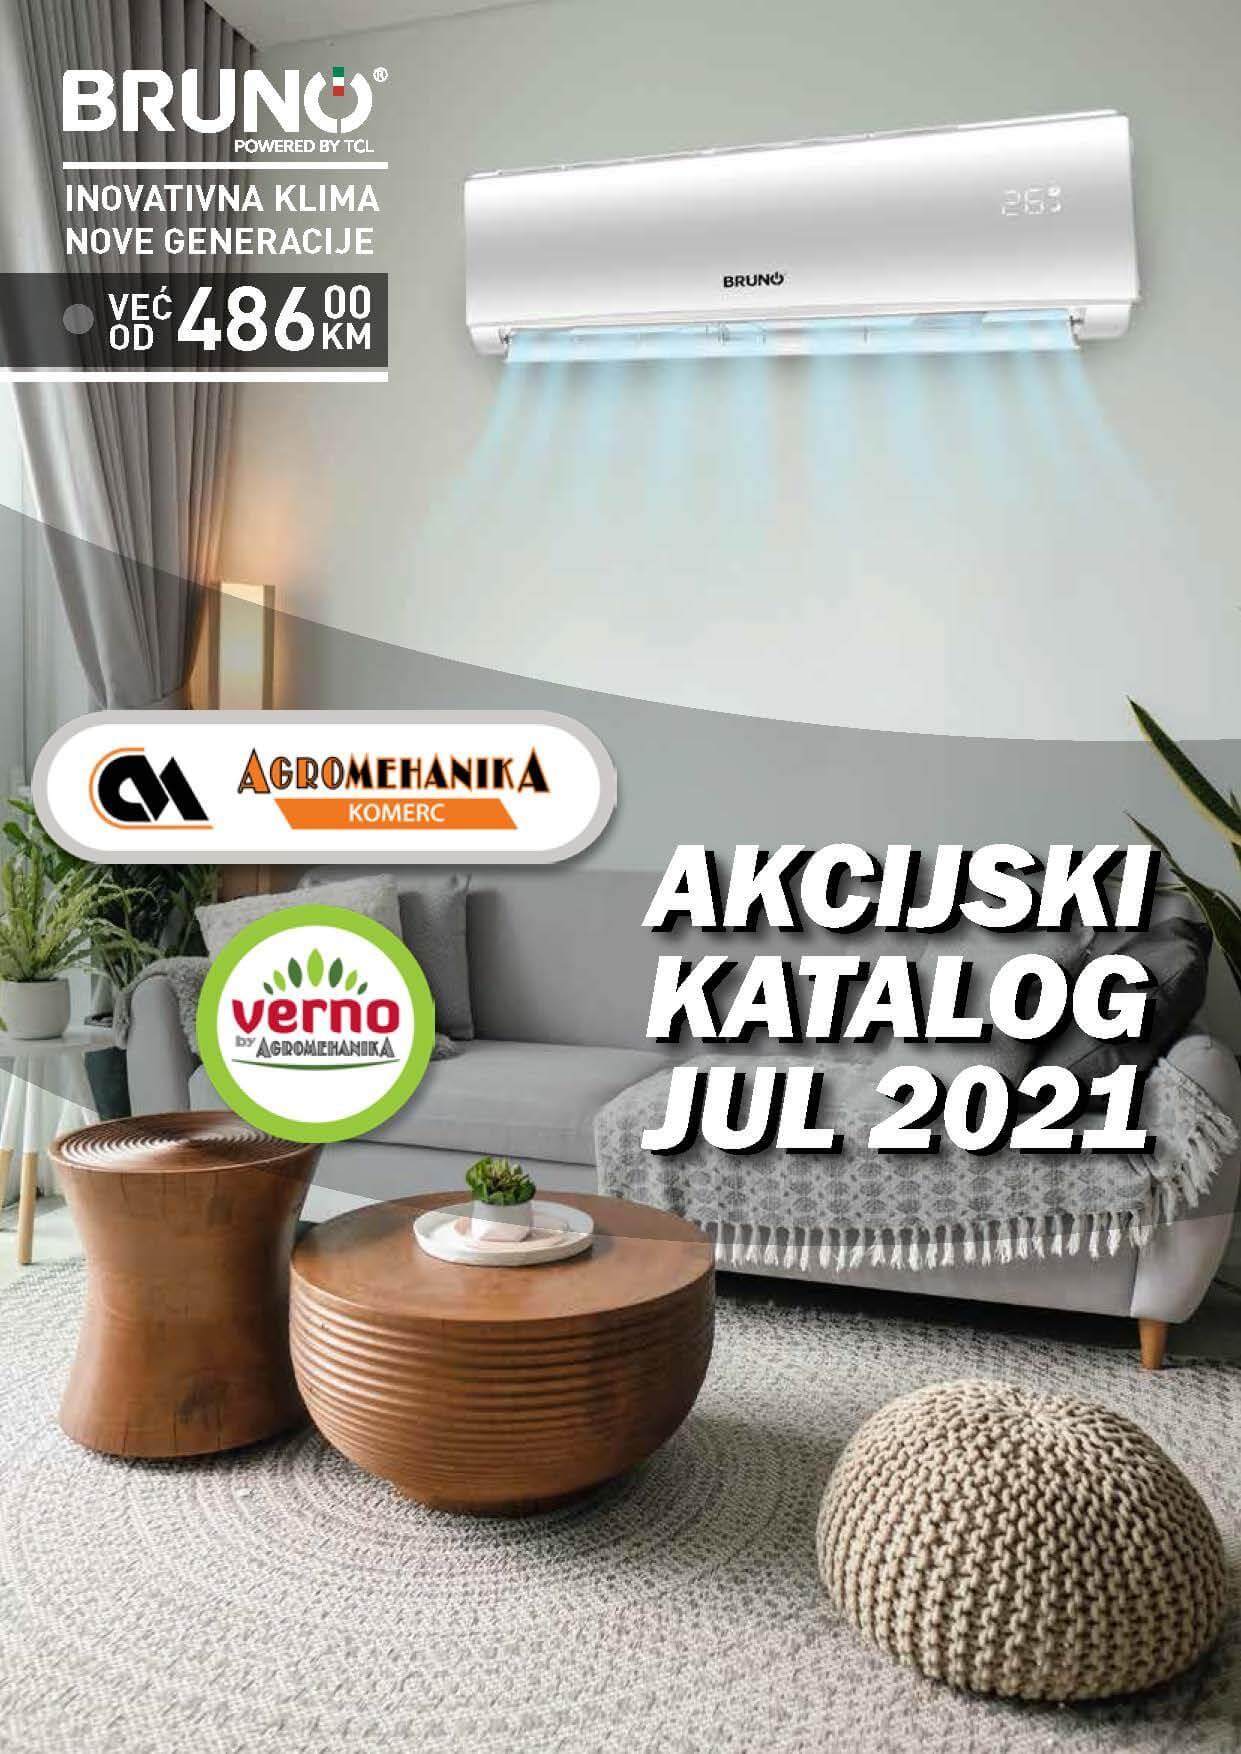 VERNO AGROMEHANIKA Akcijski Katalog JUL 2021 1.7.2021. 31.7.2021. Page 01 1